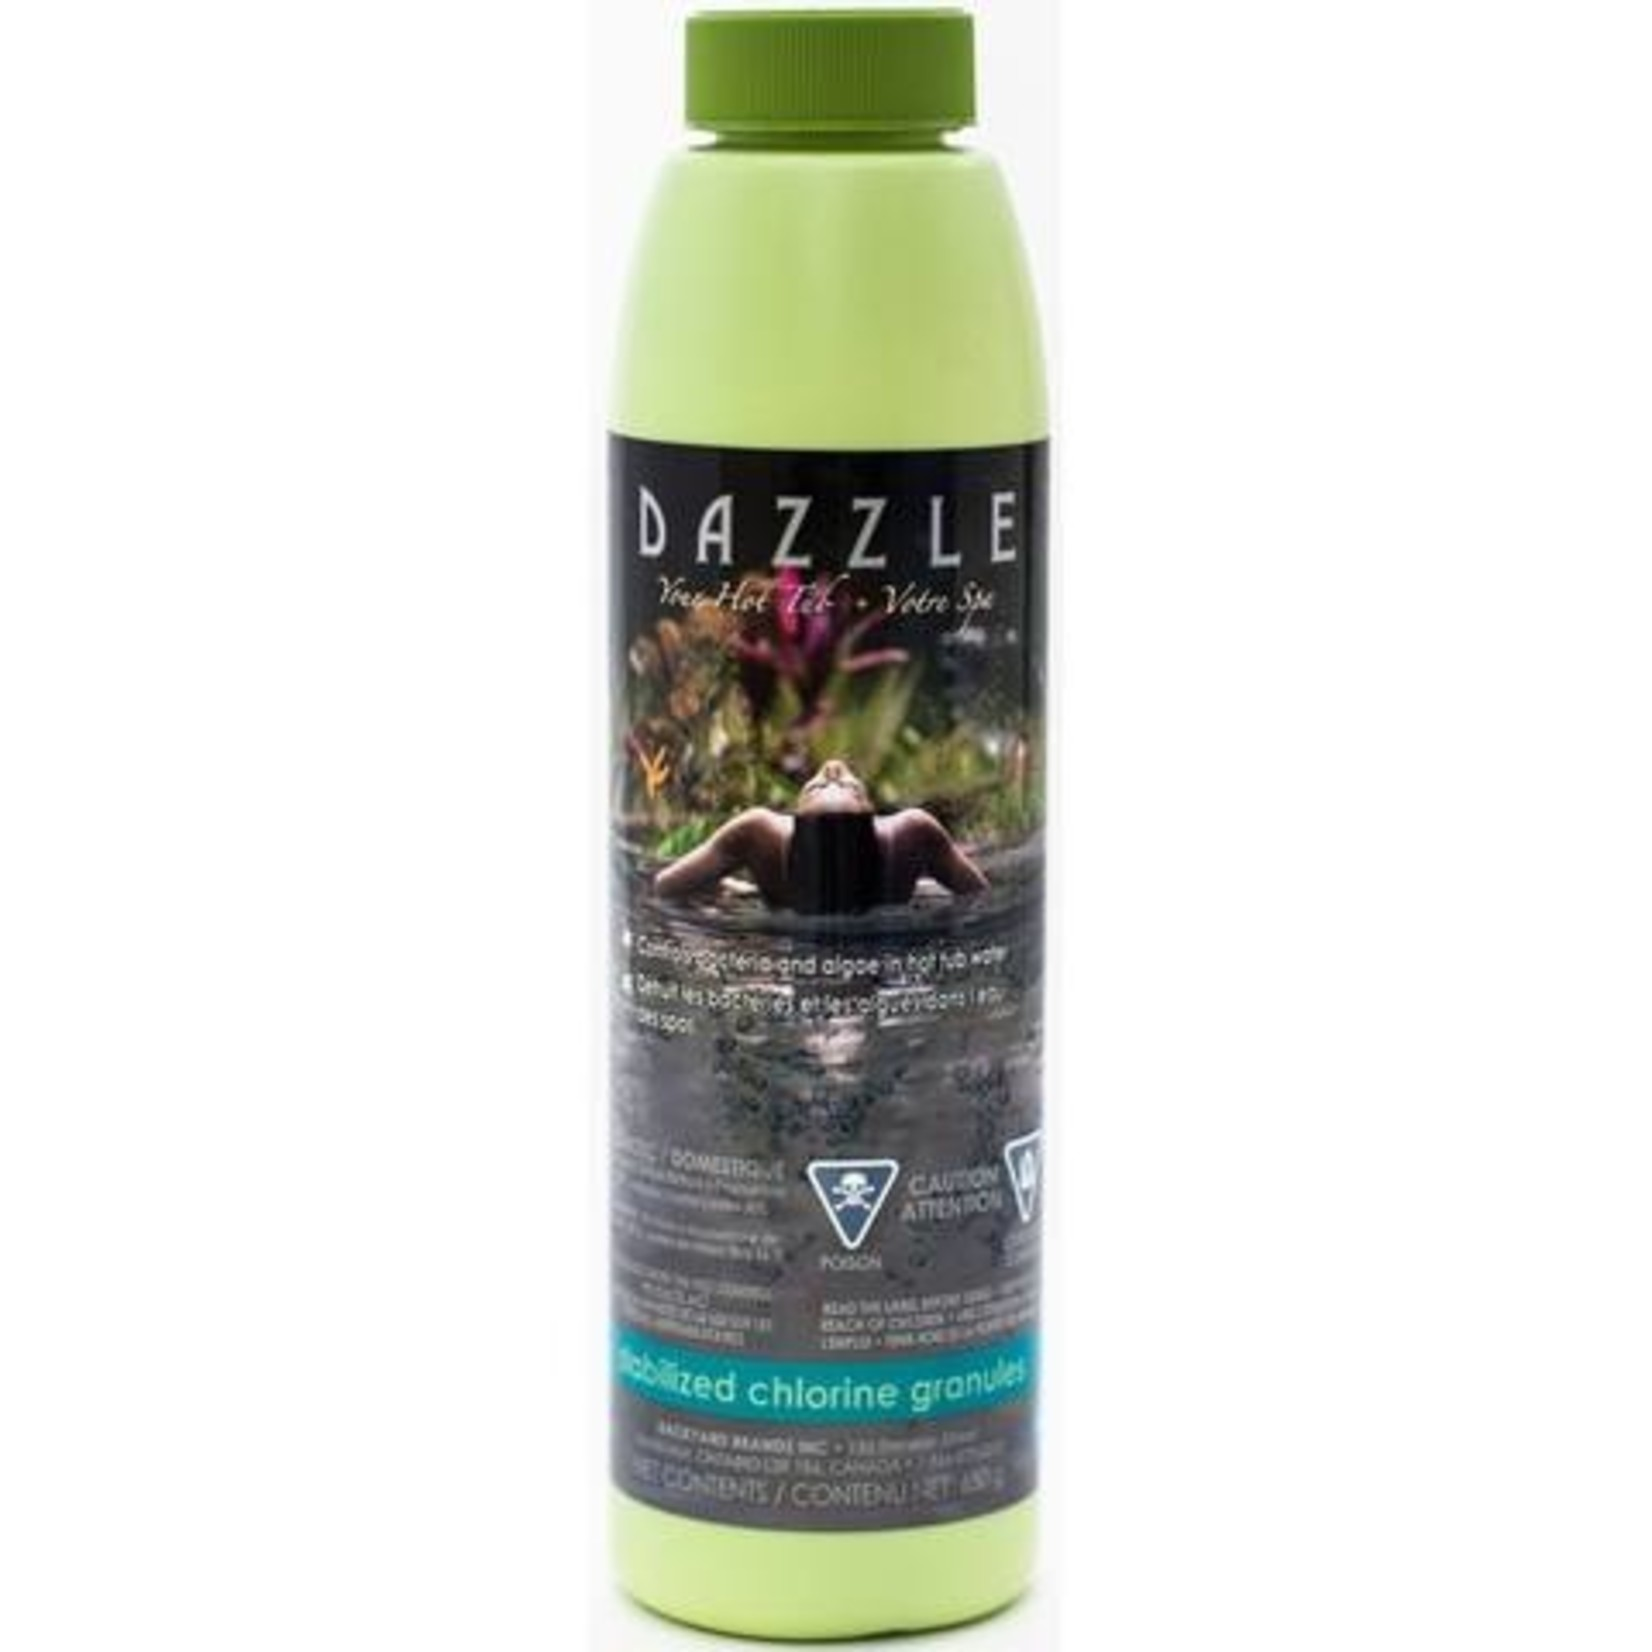 Dazzle Stabilized Chlorine Granules (650 g)